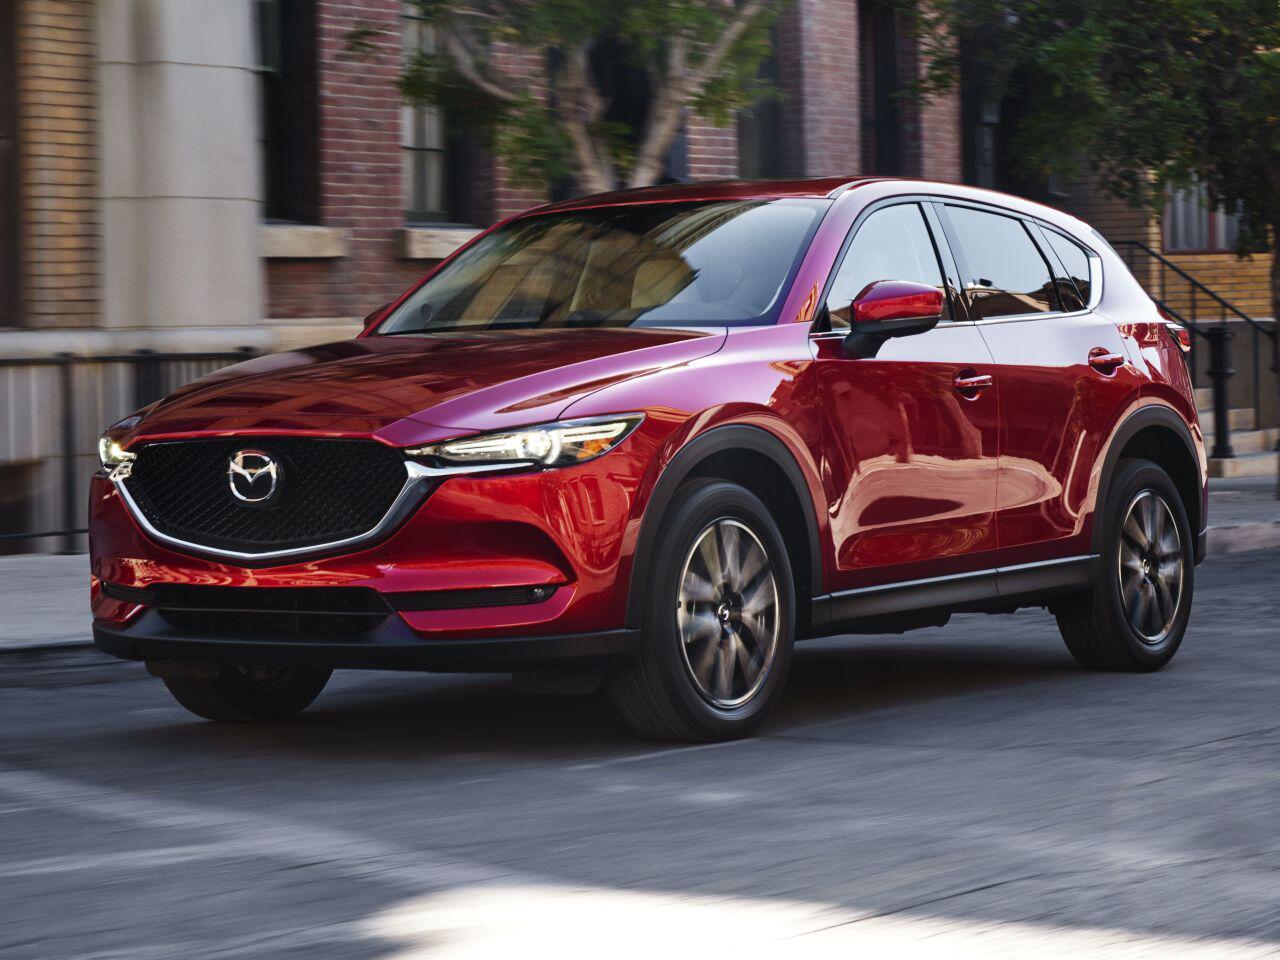 Bild zu Platz 7: Mazda CX-5